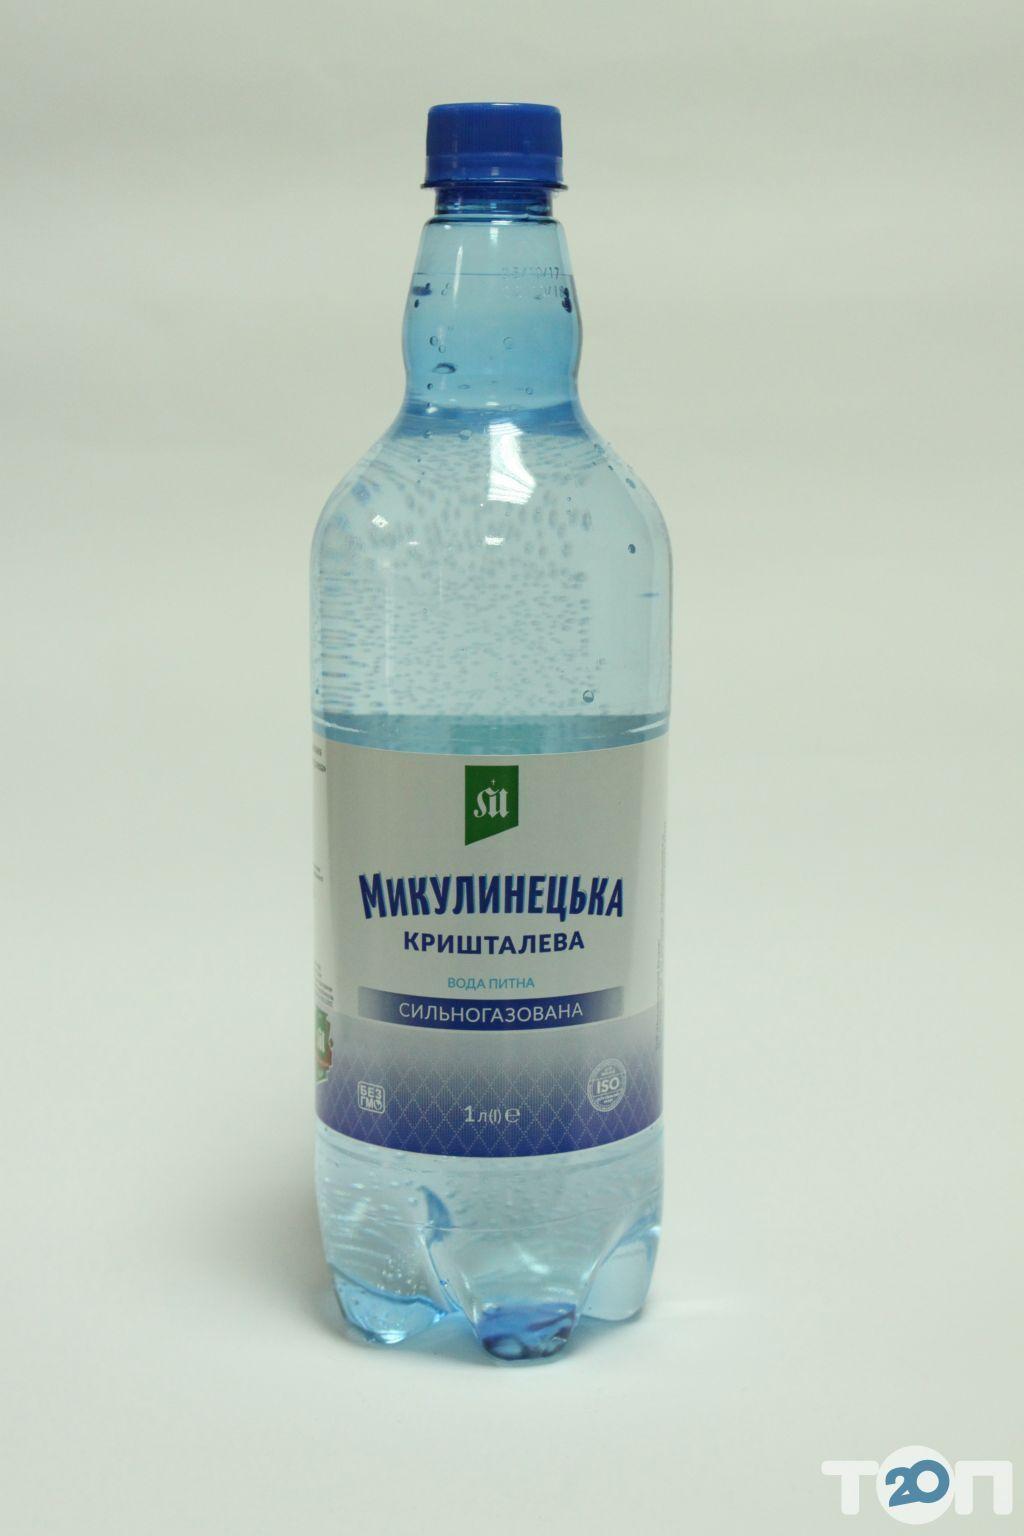 Микулинецький Бровар, виробник безалкогольних напоїв - фото 2